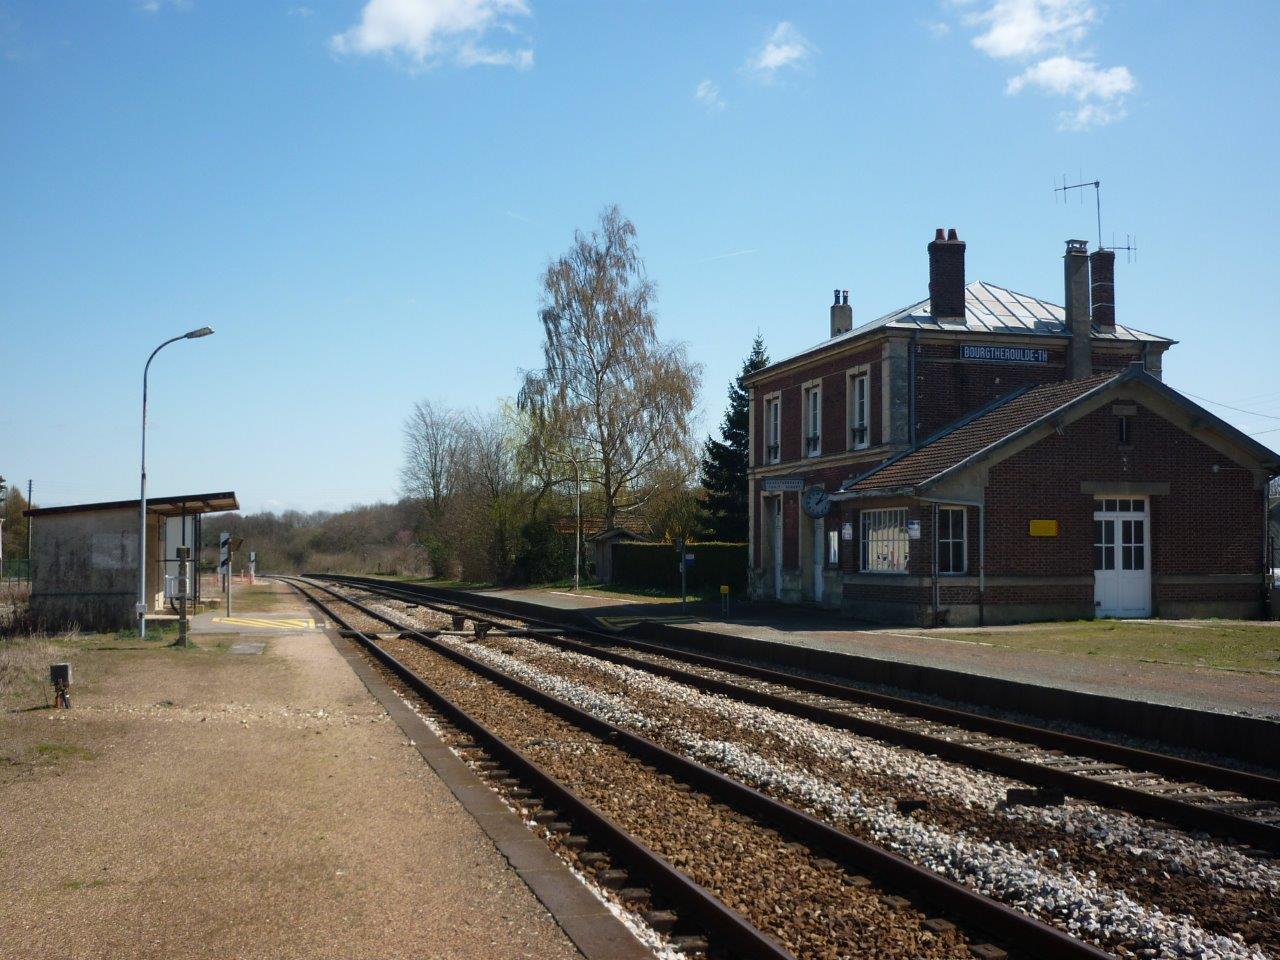 gare-de-bourgtheroulde-thuit-hebert-train-station